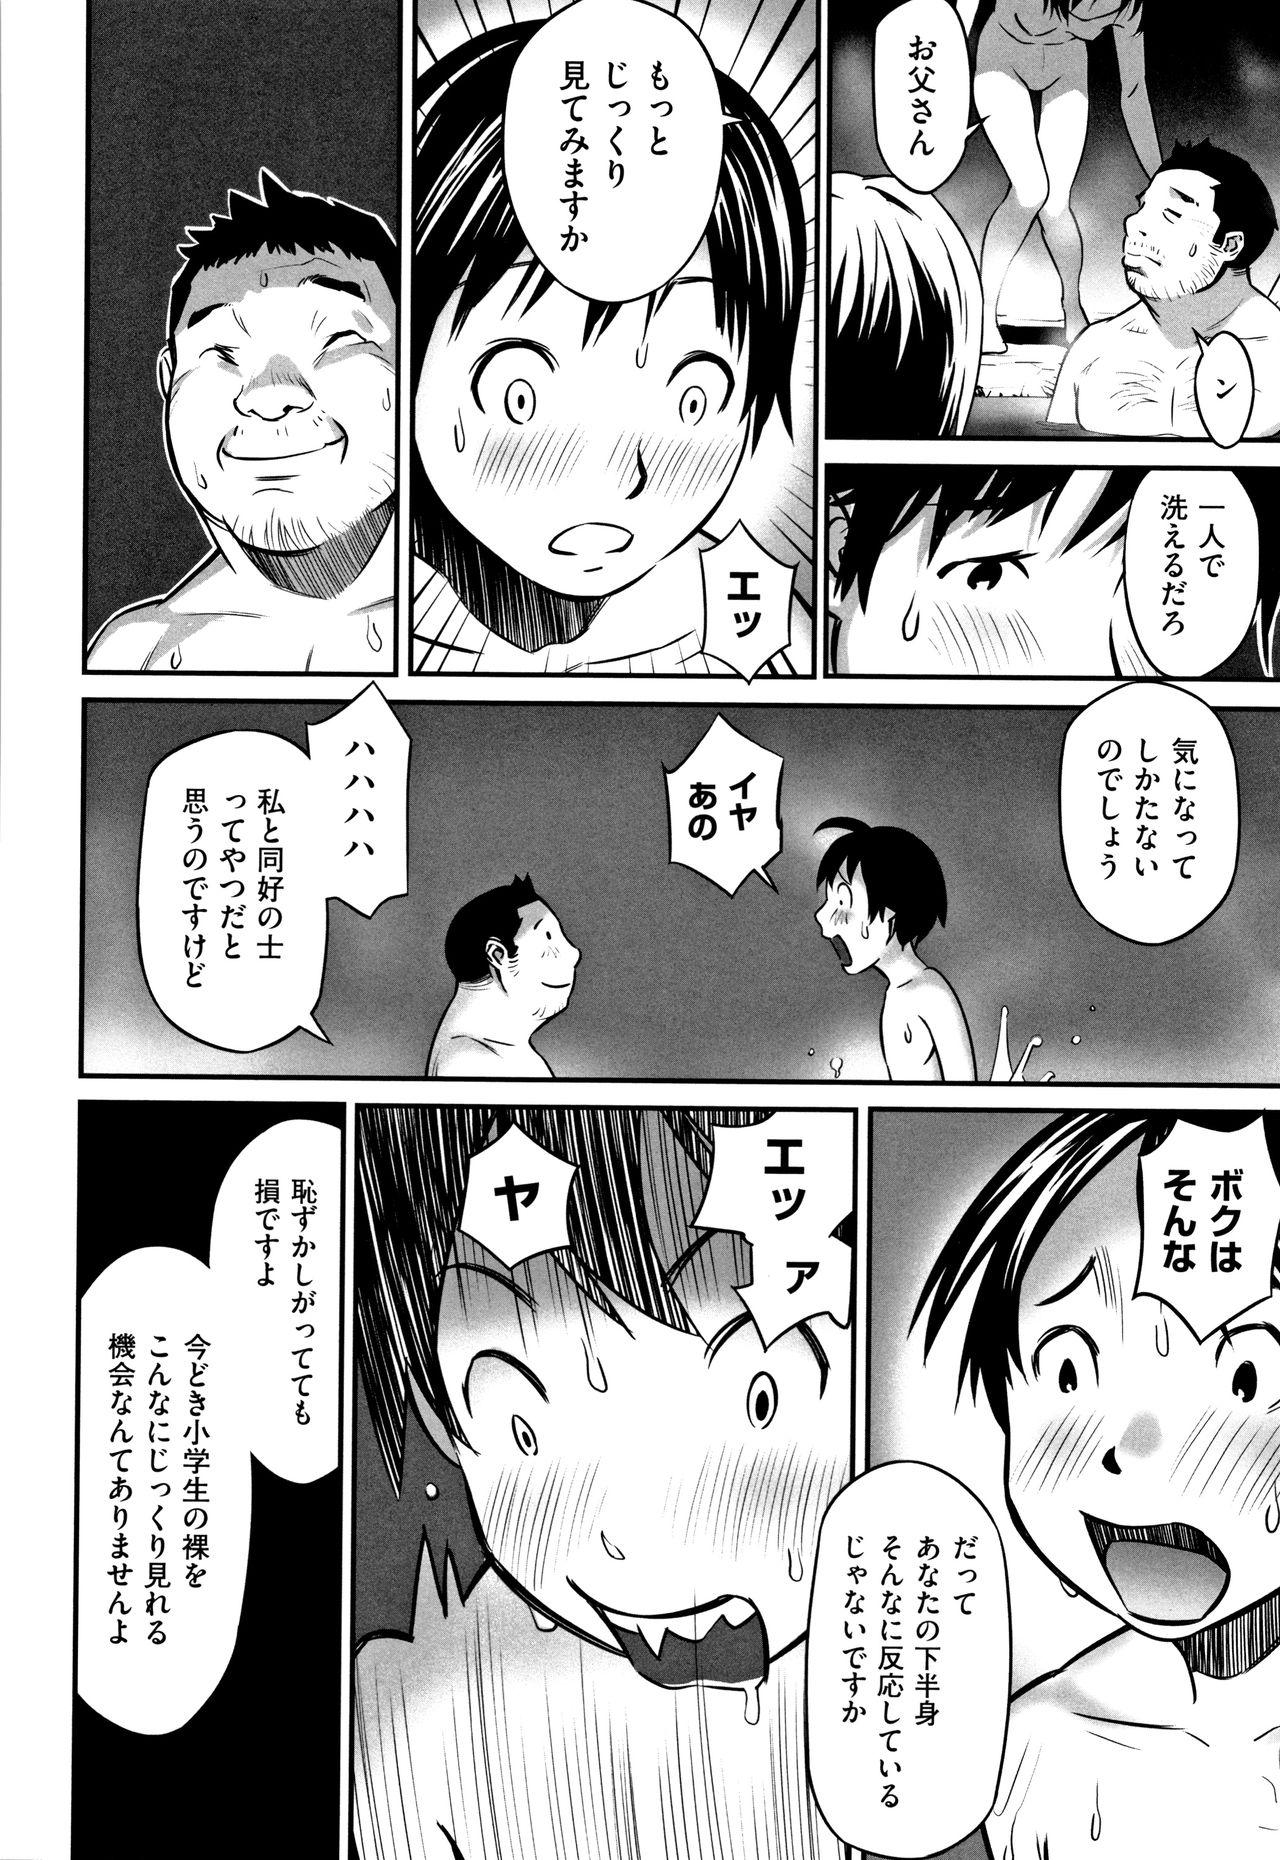 Shoujo Kumikyoku 11 156